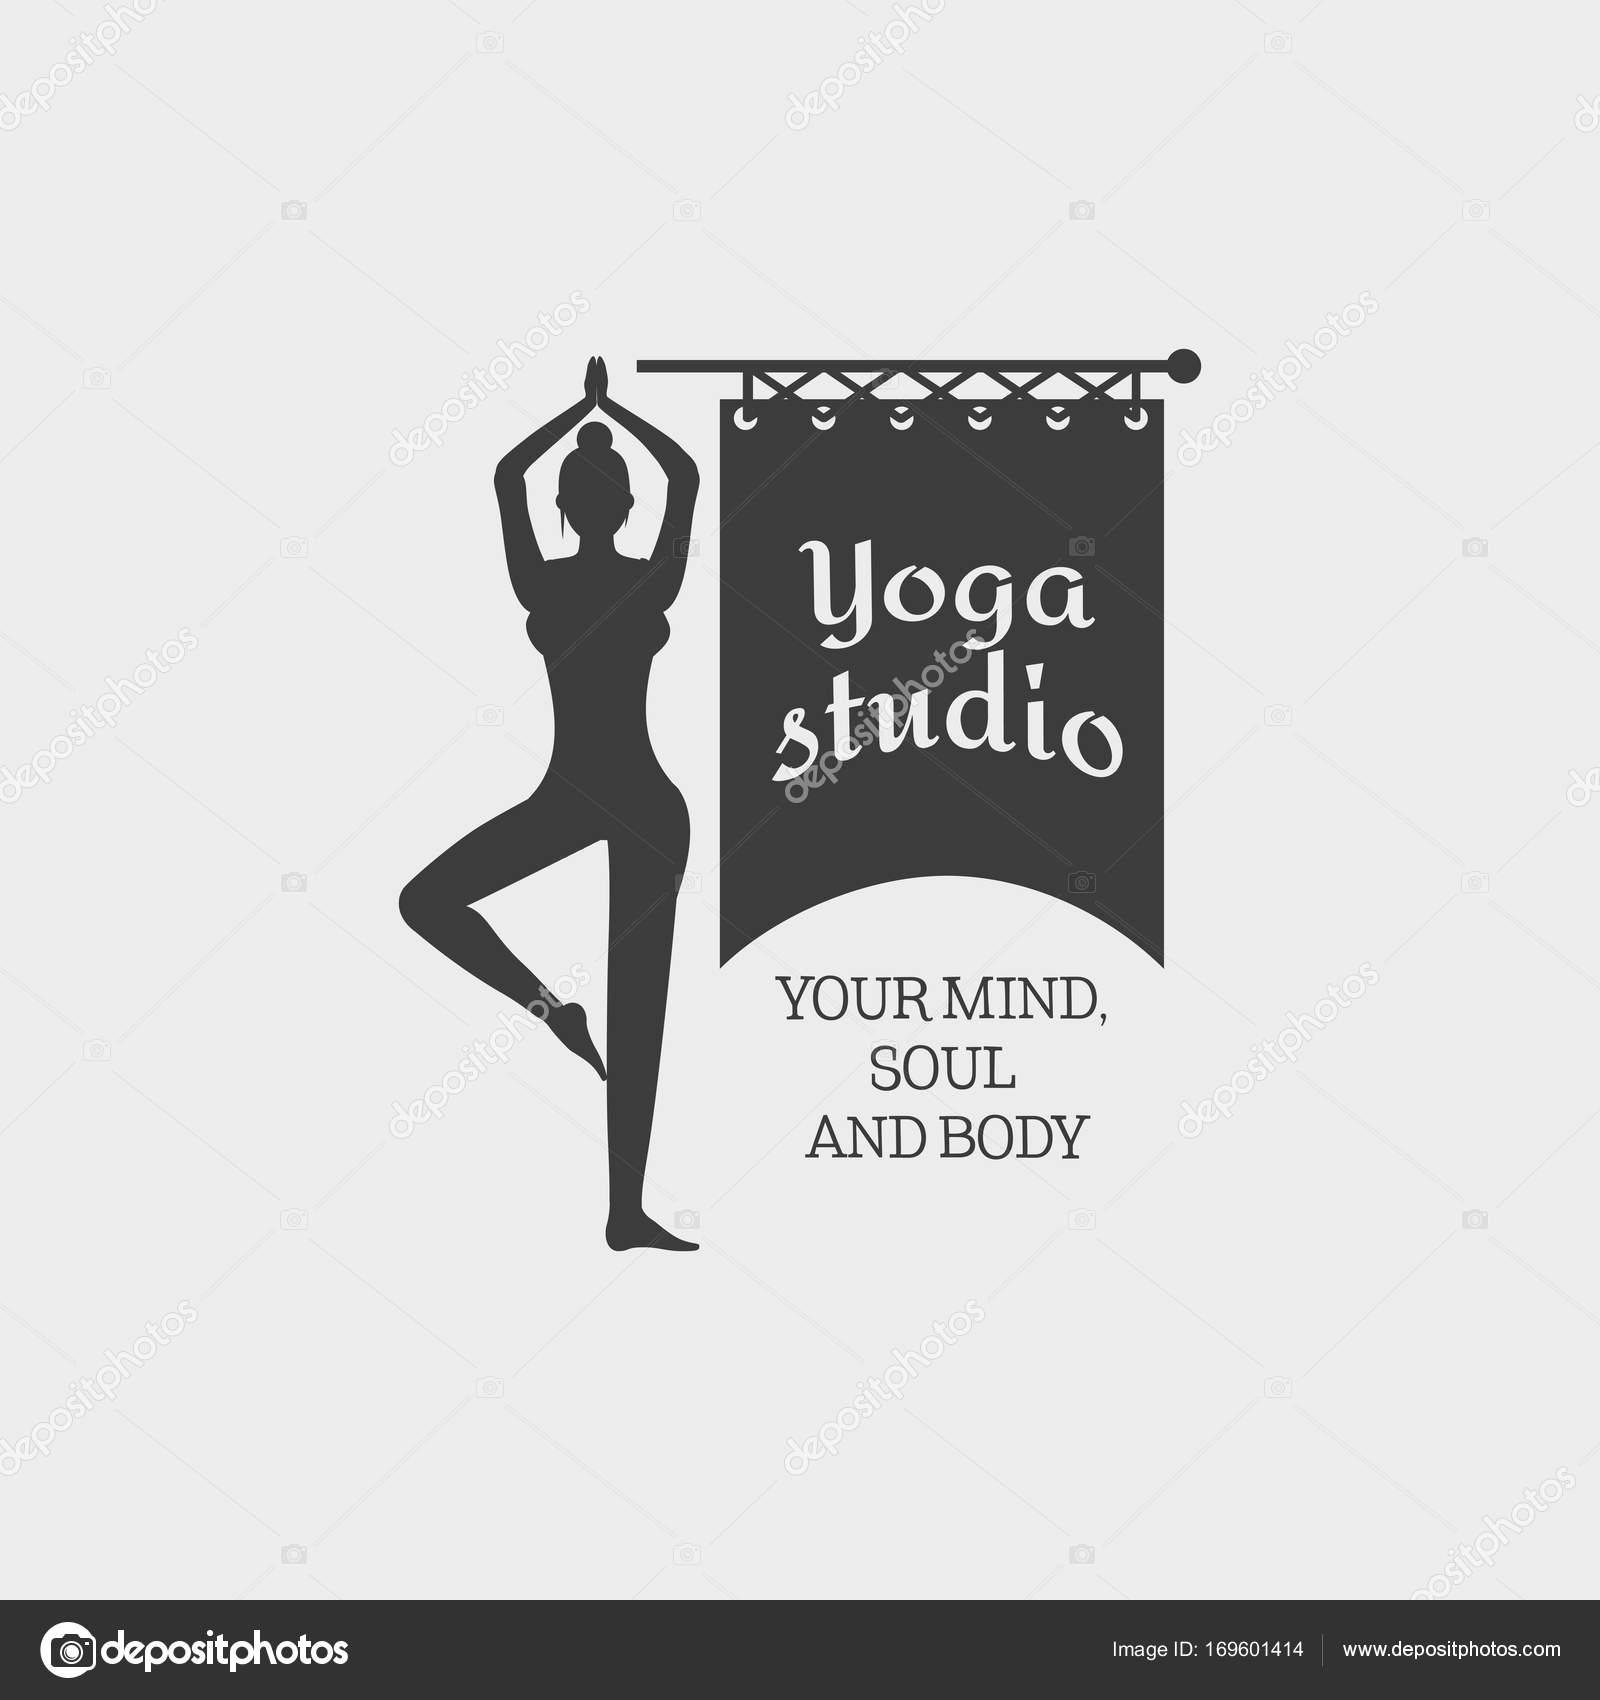 Yoga Studio Tarjeta plantilla — Vector de stock © Woters #169601414